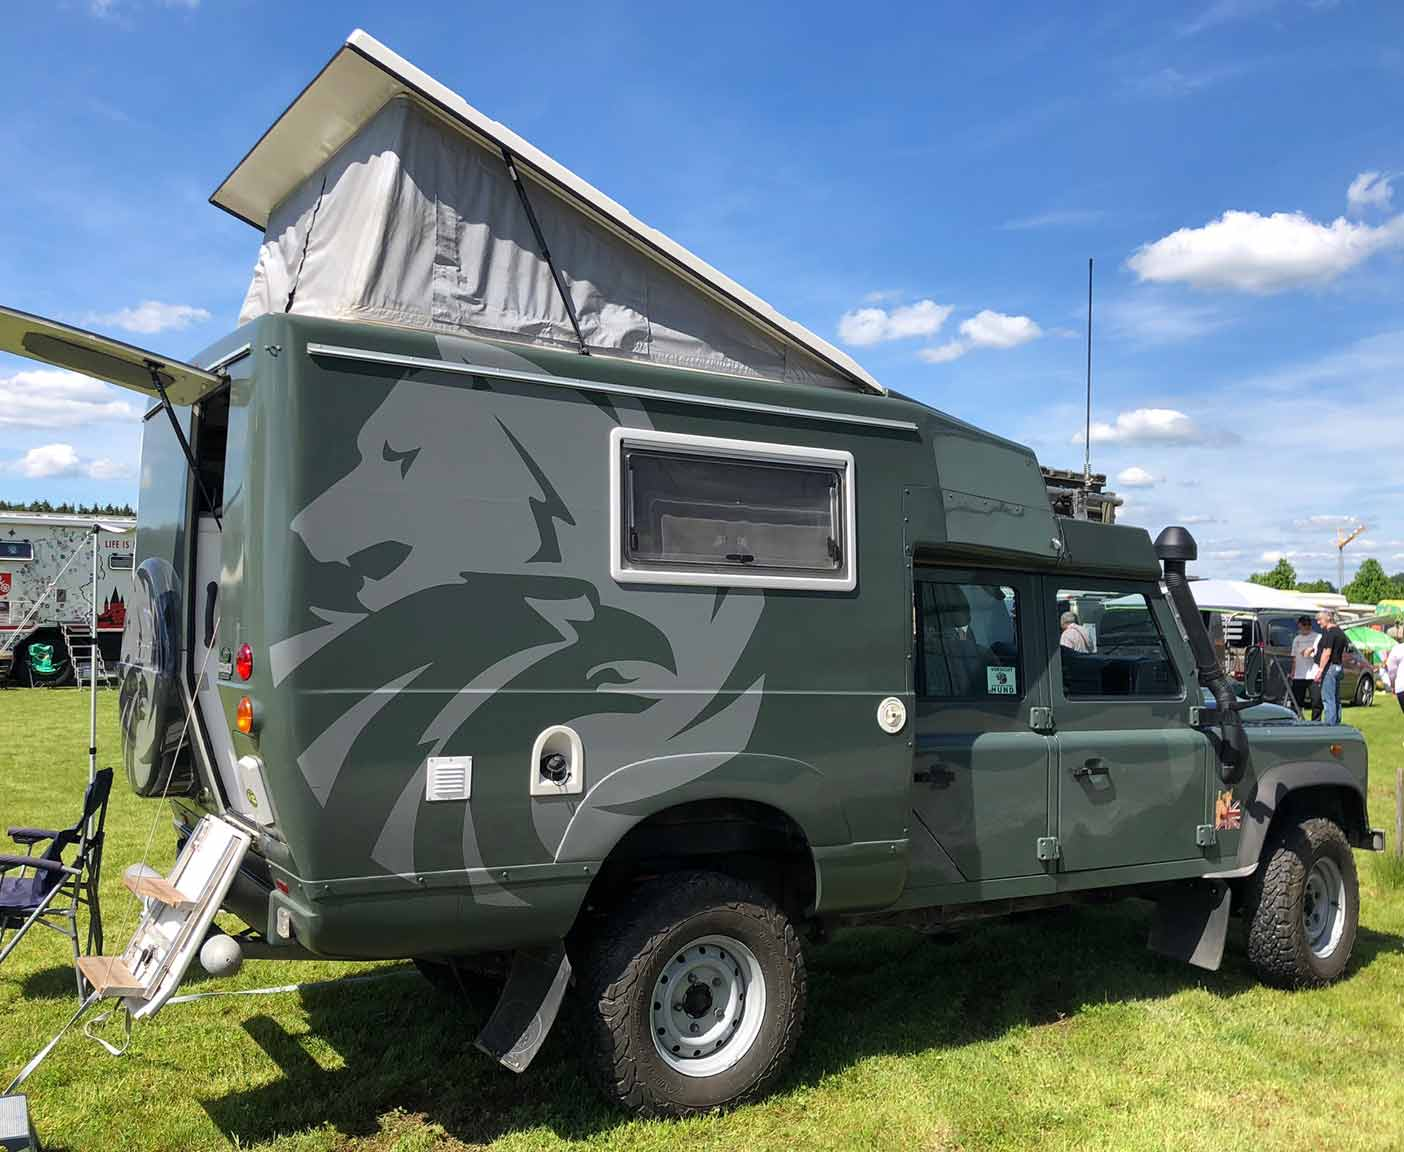 crazy-camping-oldtimer-hymer-museum-treffen-caravano-landrover-defender